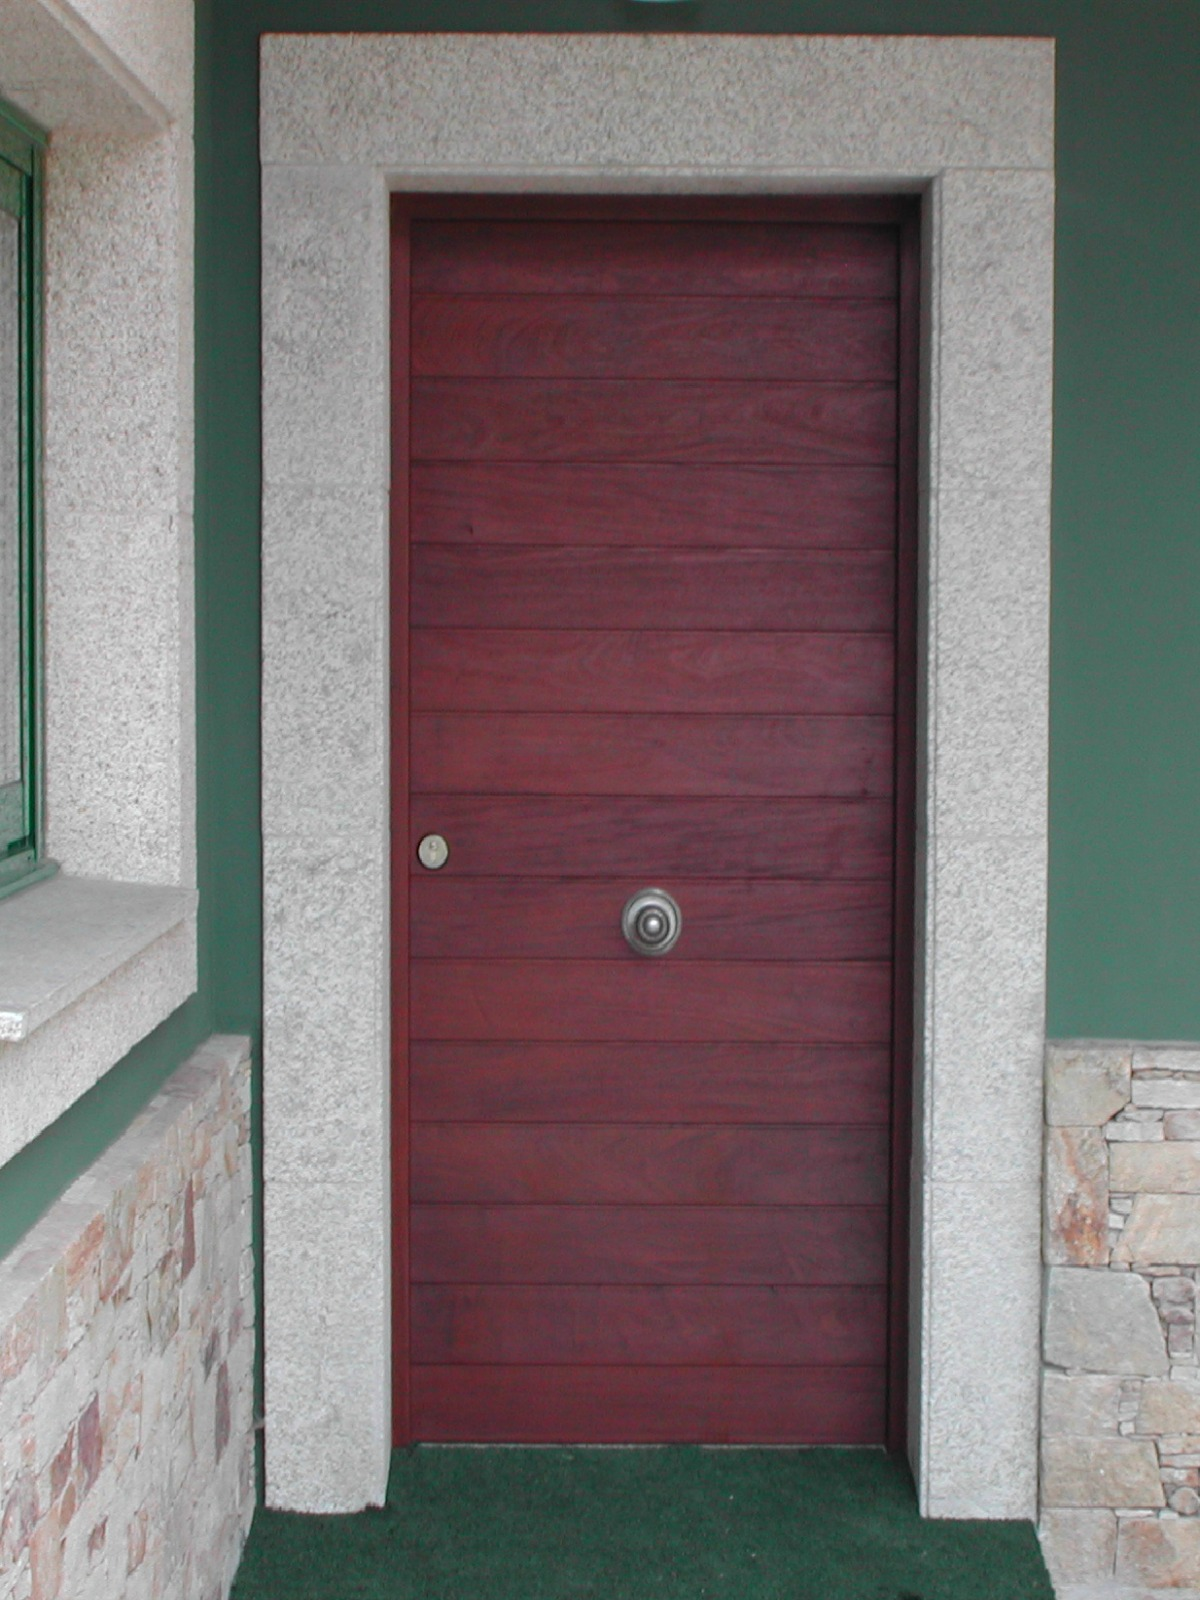 Puertas de entrada en coru a vetta grupo carpinteria - Fotos para puertas ...